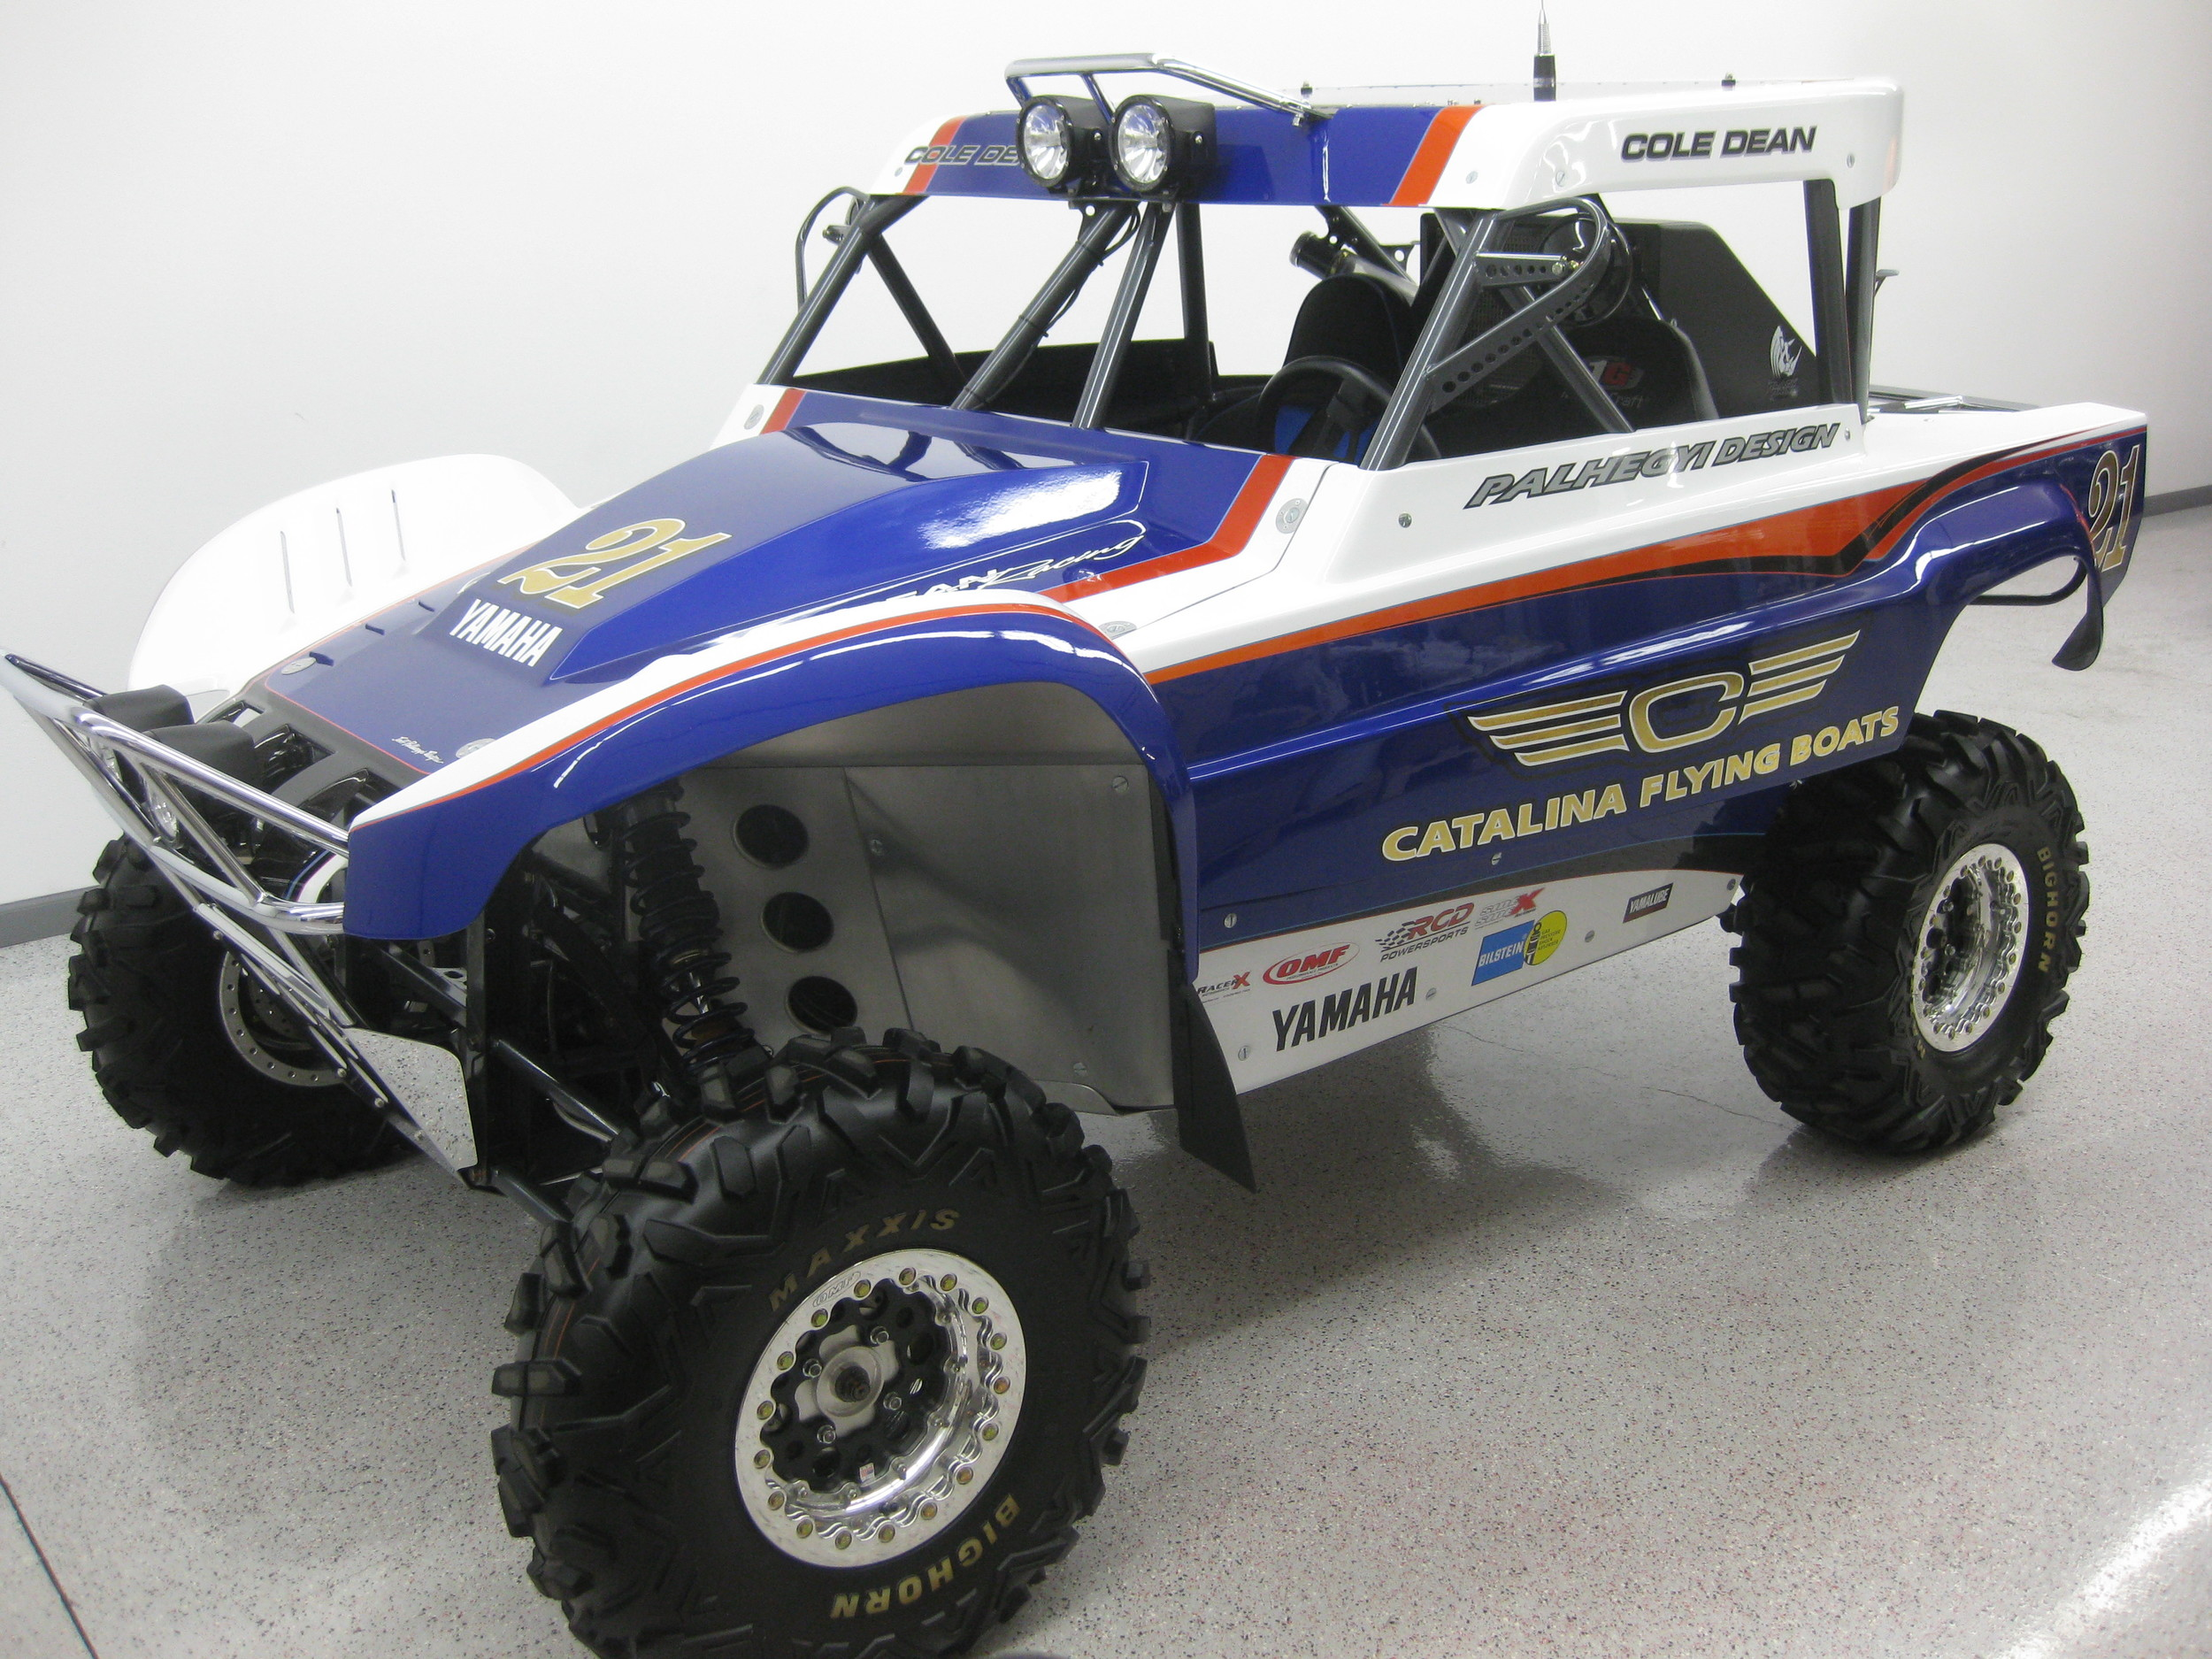 Cole's Custom Race Rhino